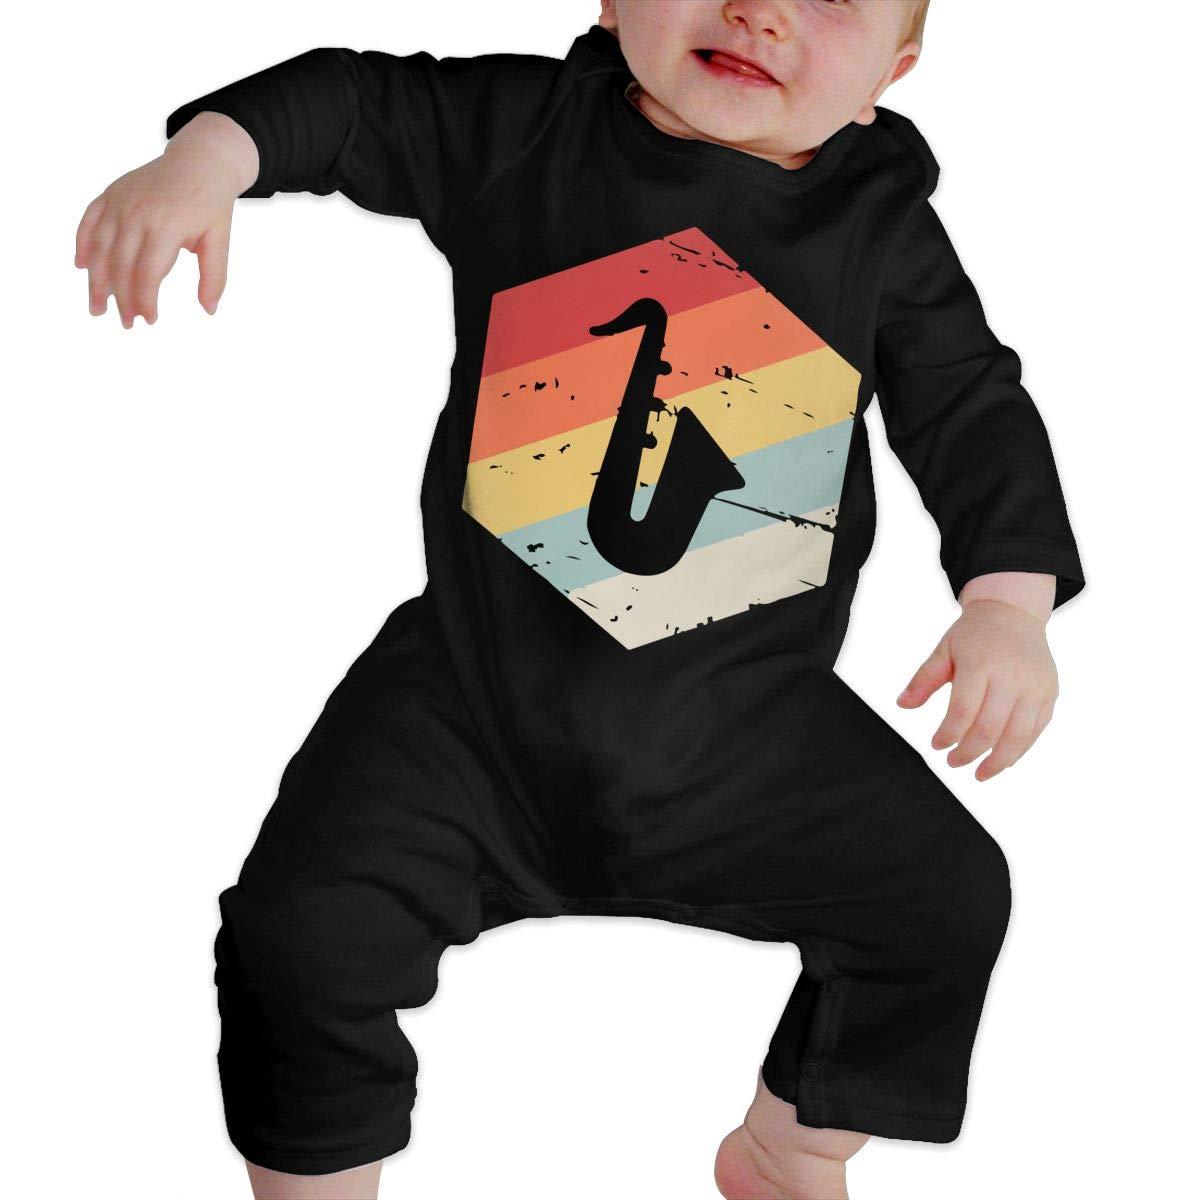 Infant Babys Cotton Long Sleeve Retro Vintage Saxophone Romper Bodysuit Funny Printed Romper Clothes